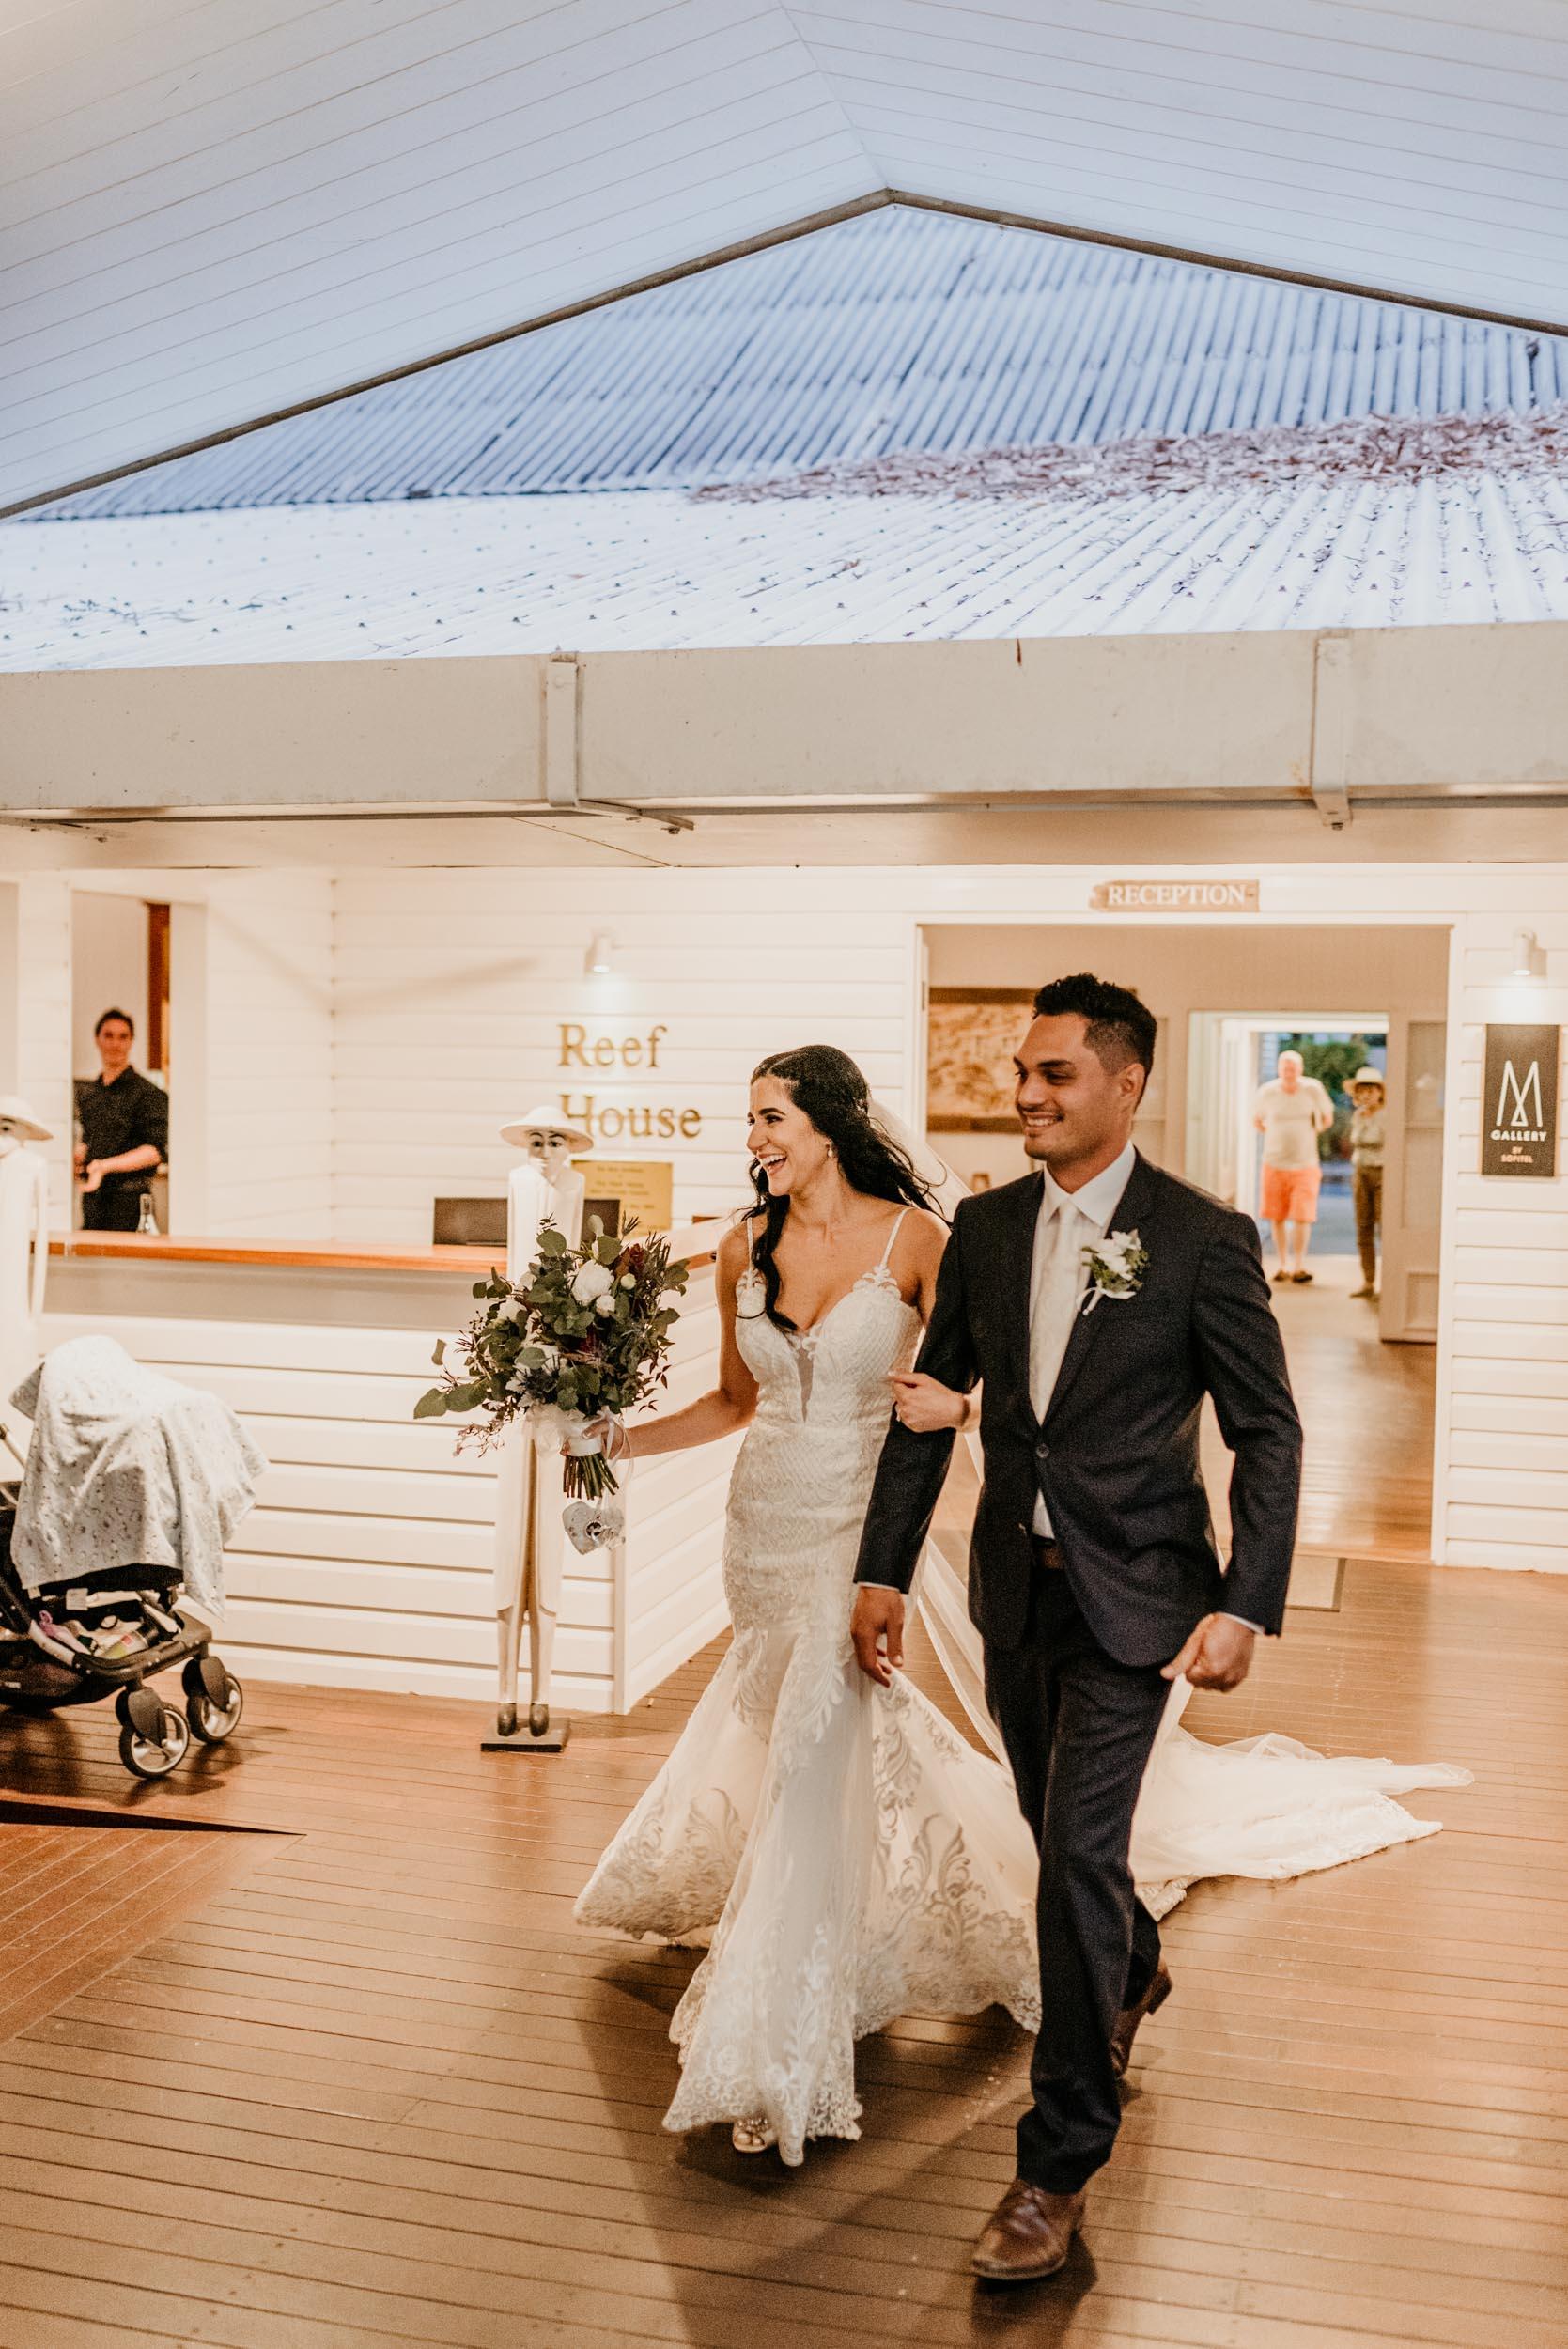 The Raw Photographer - Cairns Wedding Photographer - Beach Palm Cove Ceremony - Dress Irene Costa's Devine Bridal - Queensland-66.jpg